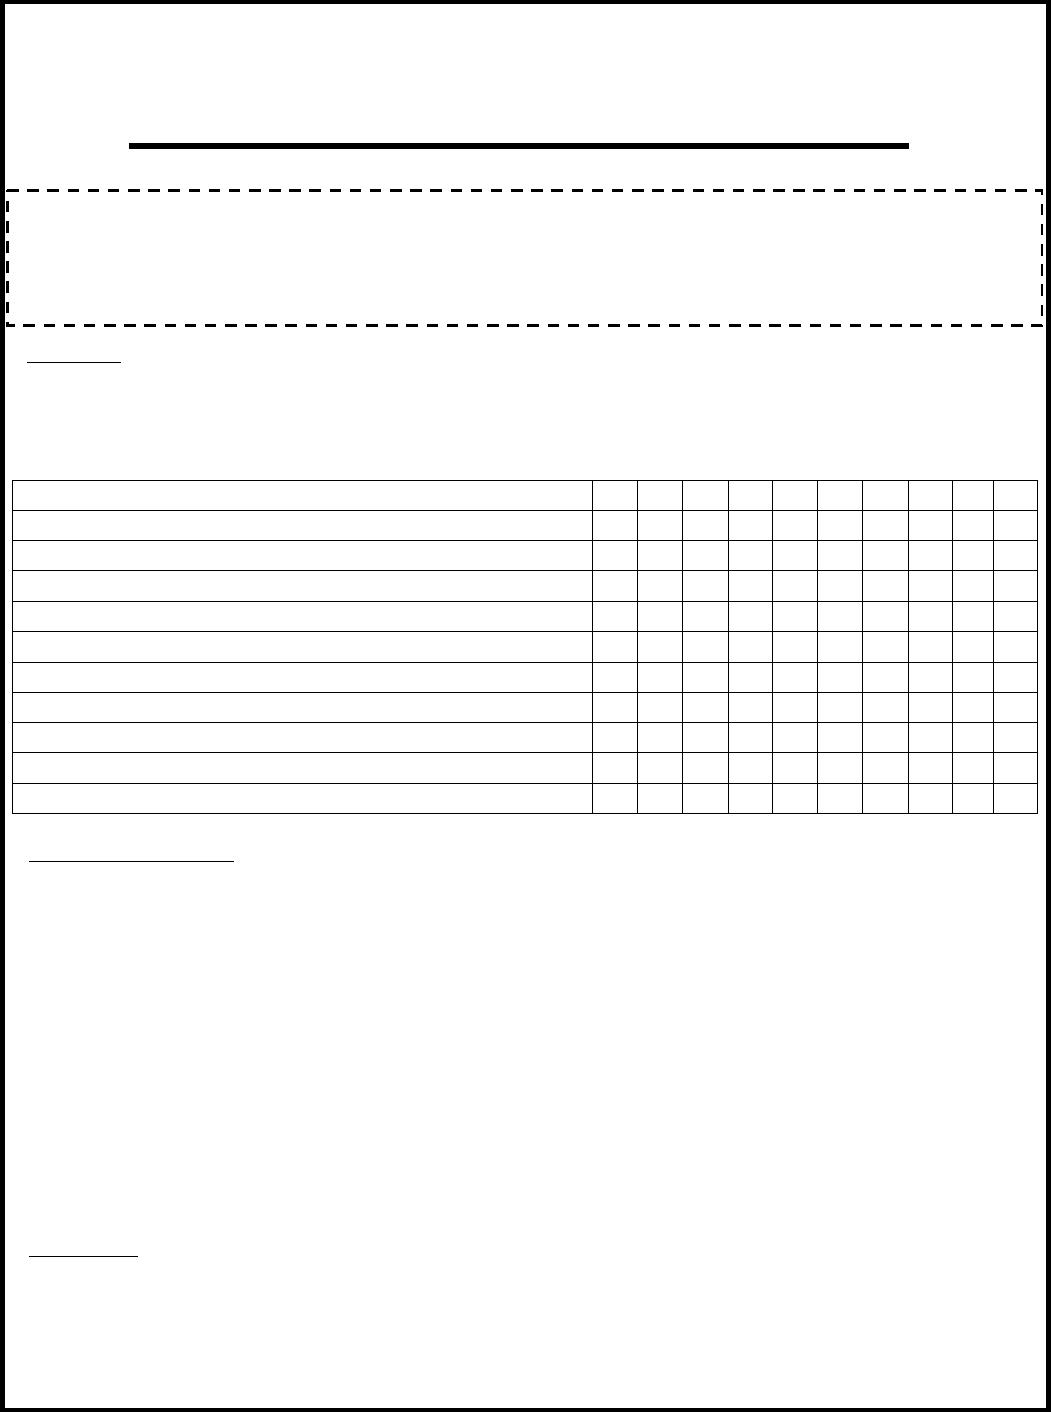 Employee satisfaction survey template in Word and Pdf formats With Employee Satisfaction Survey Template Word